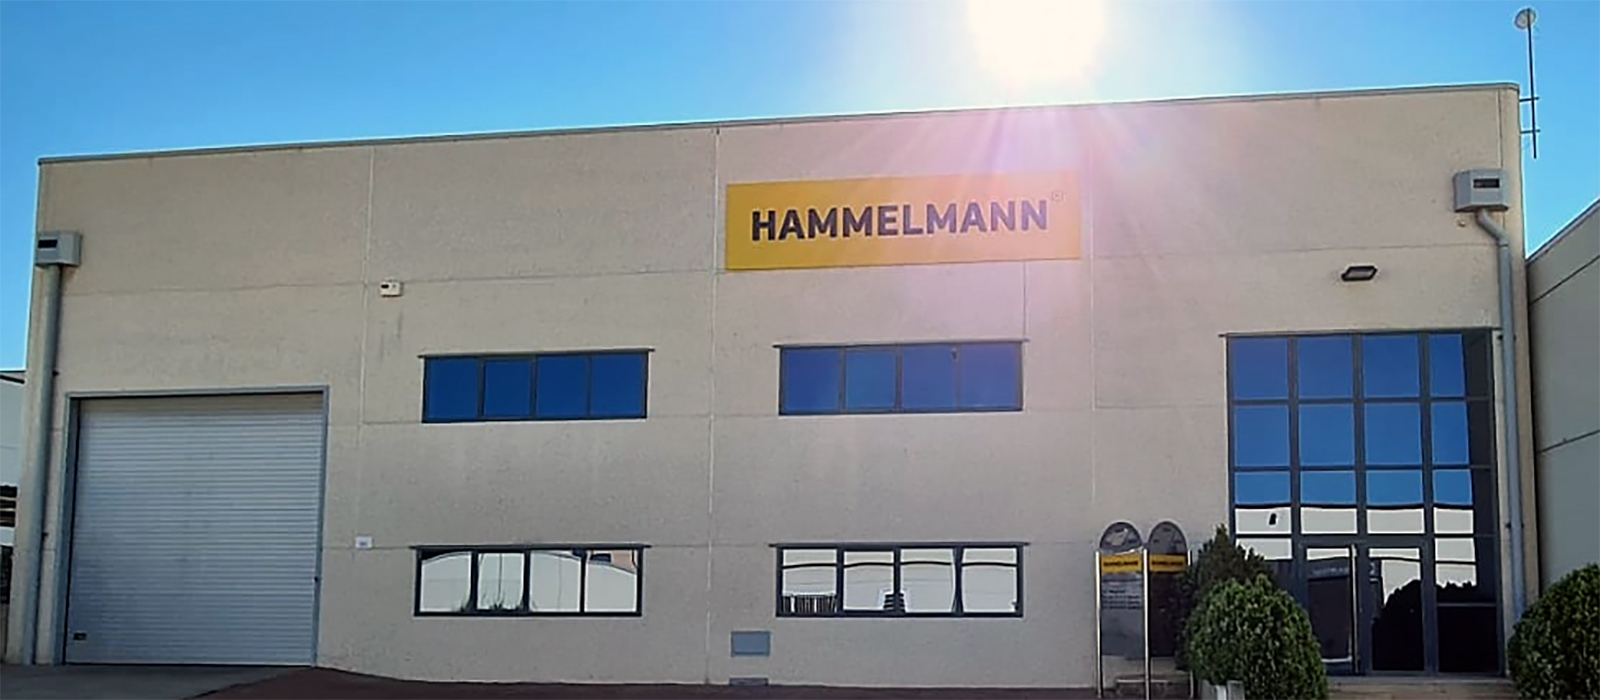 Hammelmann SL aquajet partner distributor hydrodemolition equipment